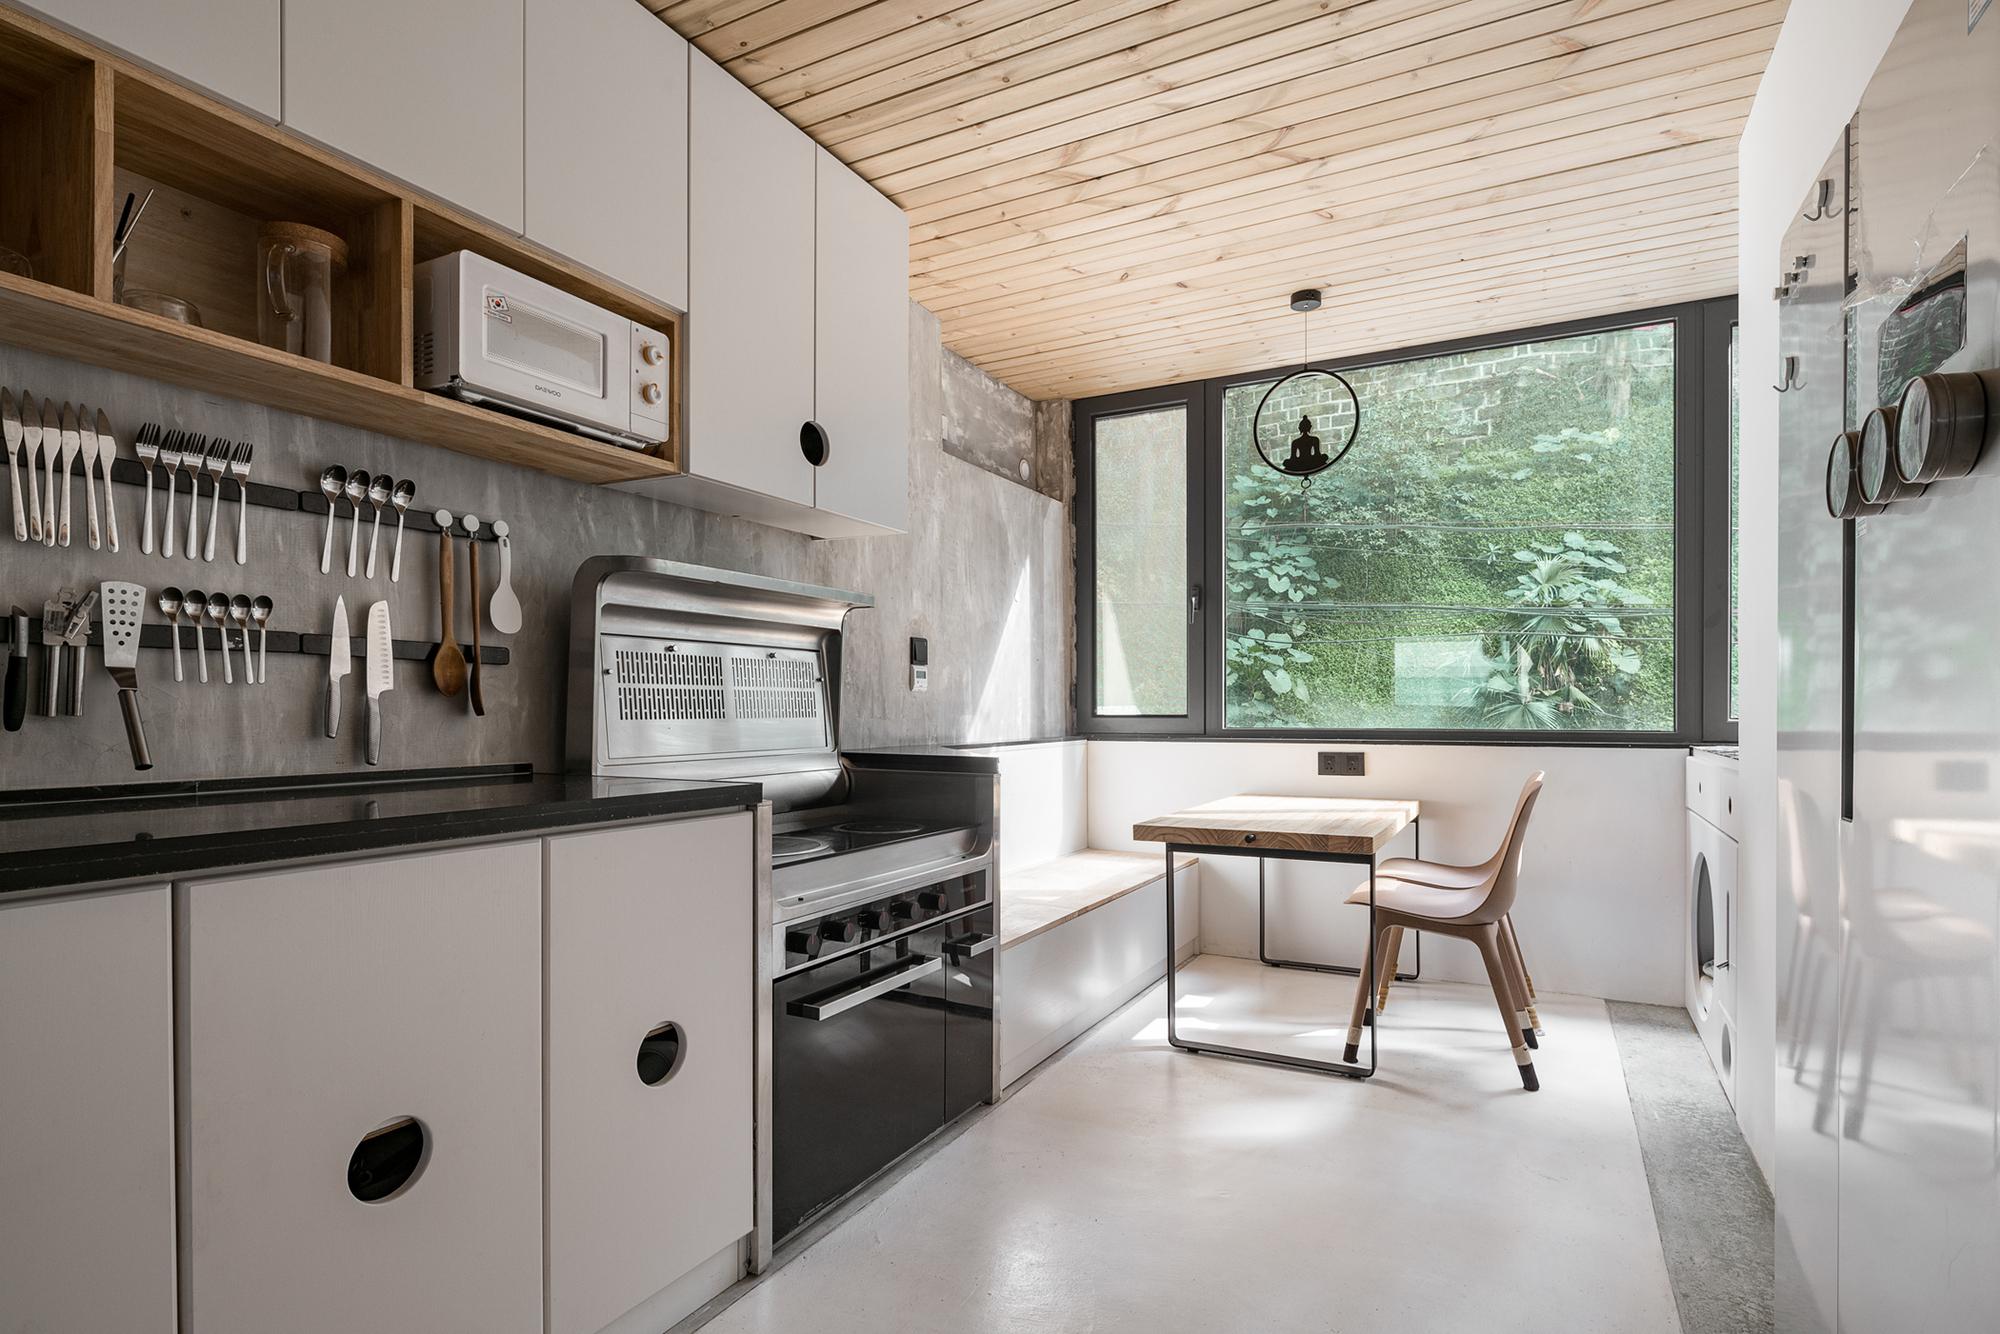 71sqm. Apartment Renovation / Xue Jin Architecture Network